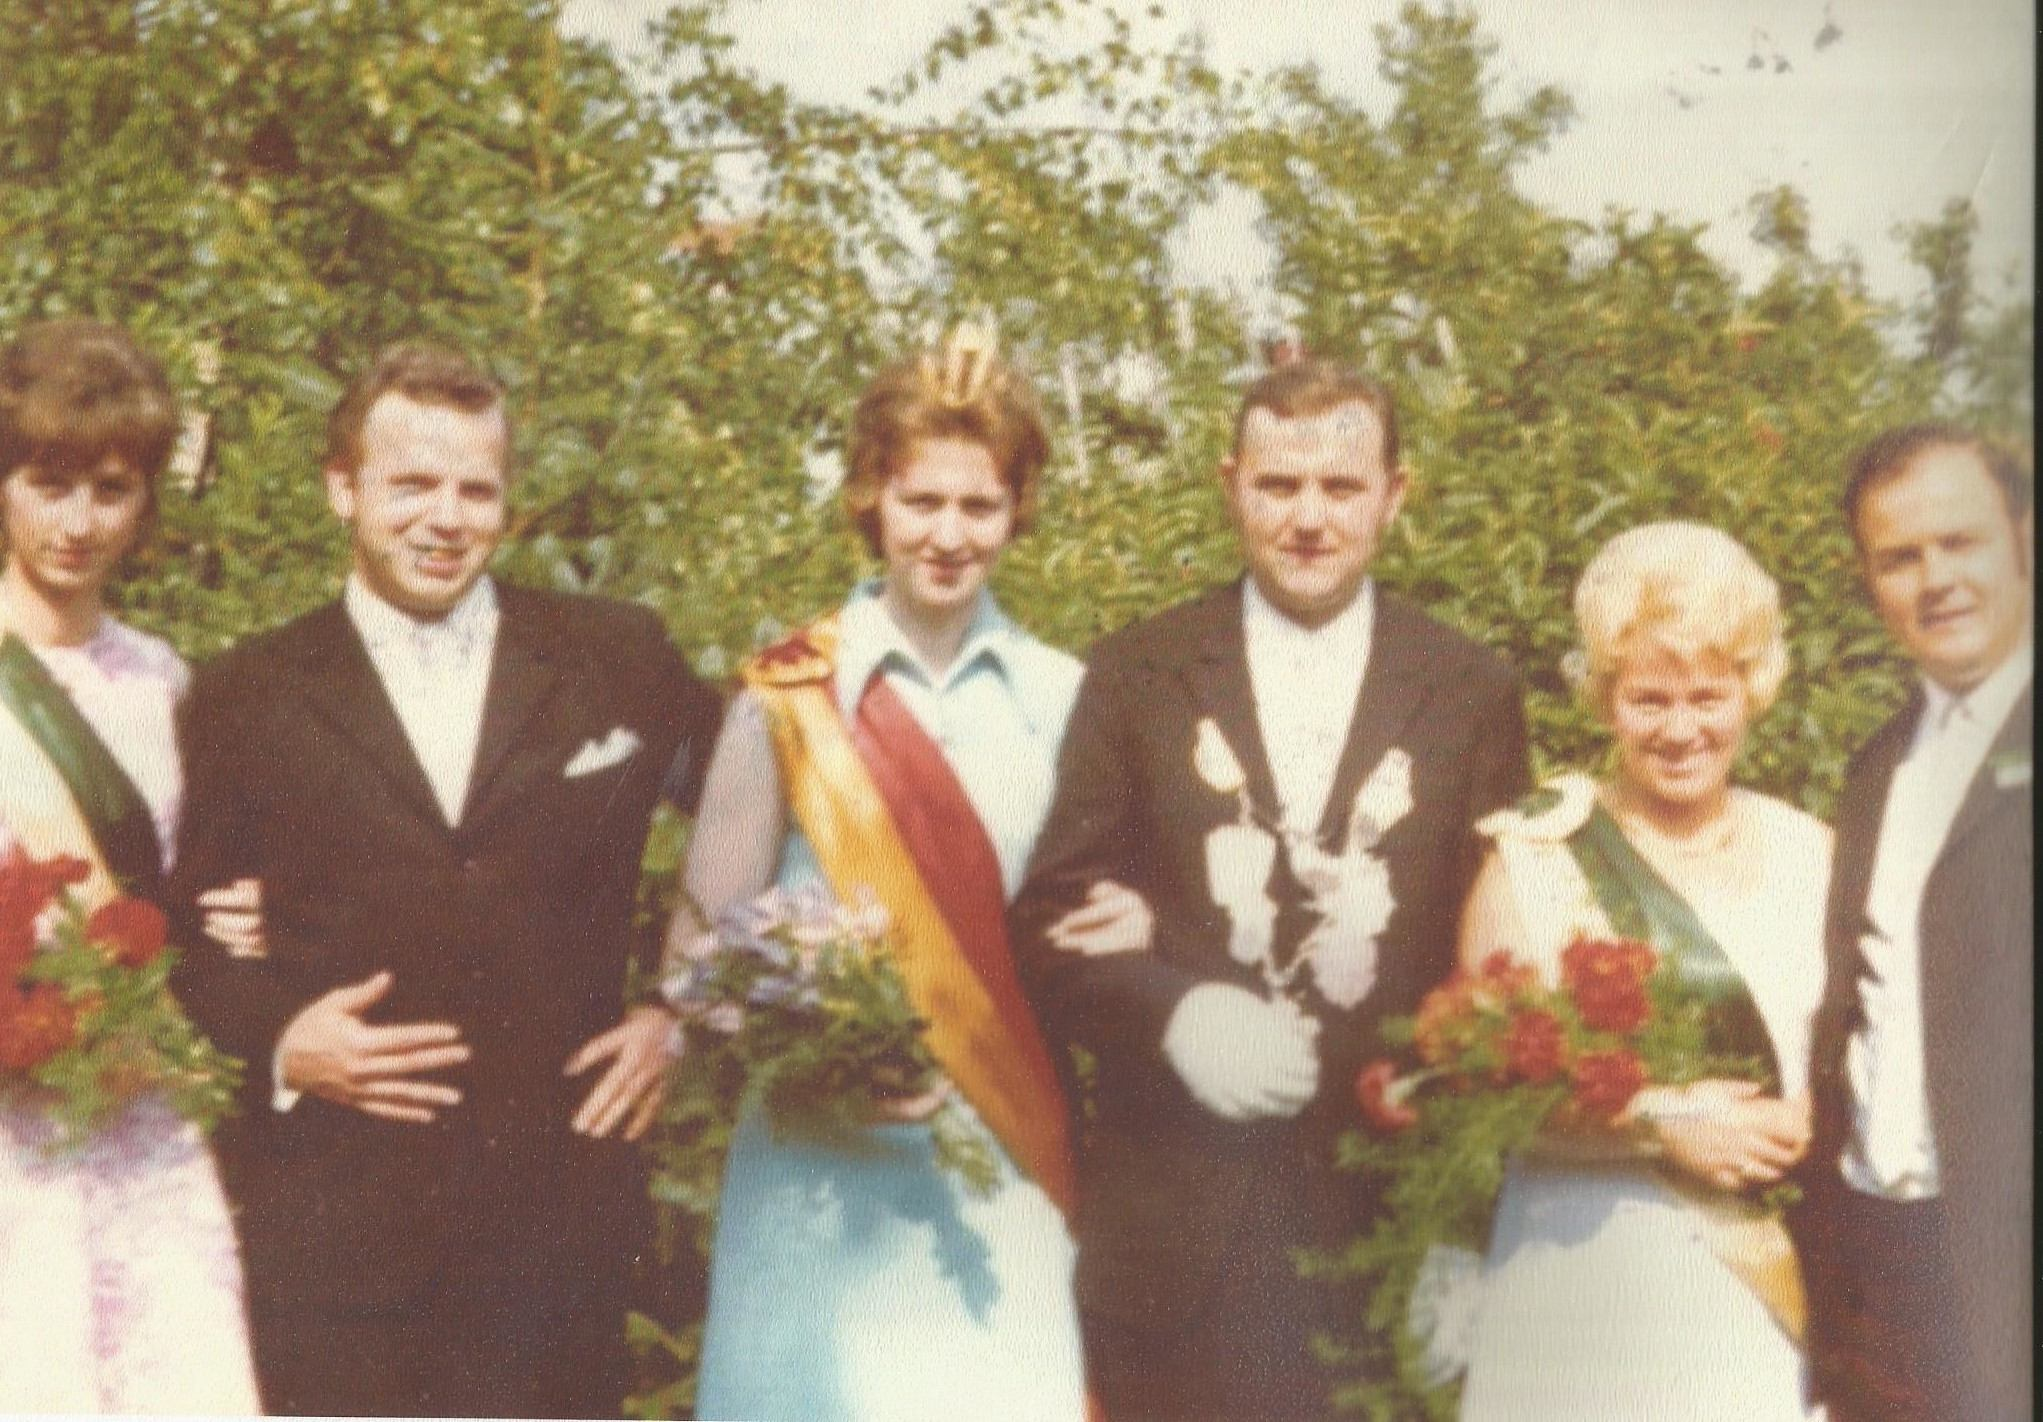 Norbert Heckenkamp und Hildegart Wiegers Königspaar 1971